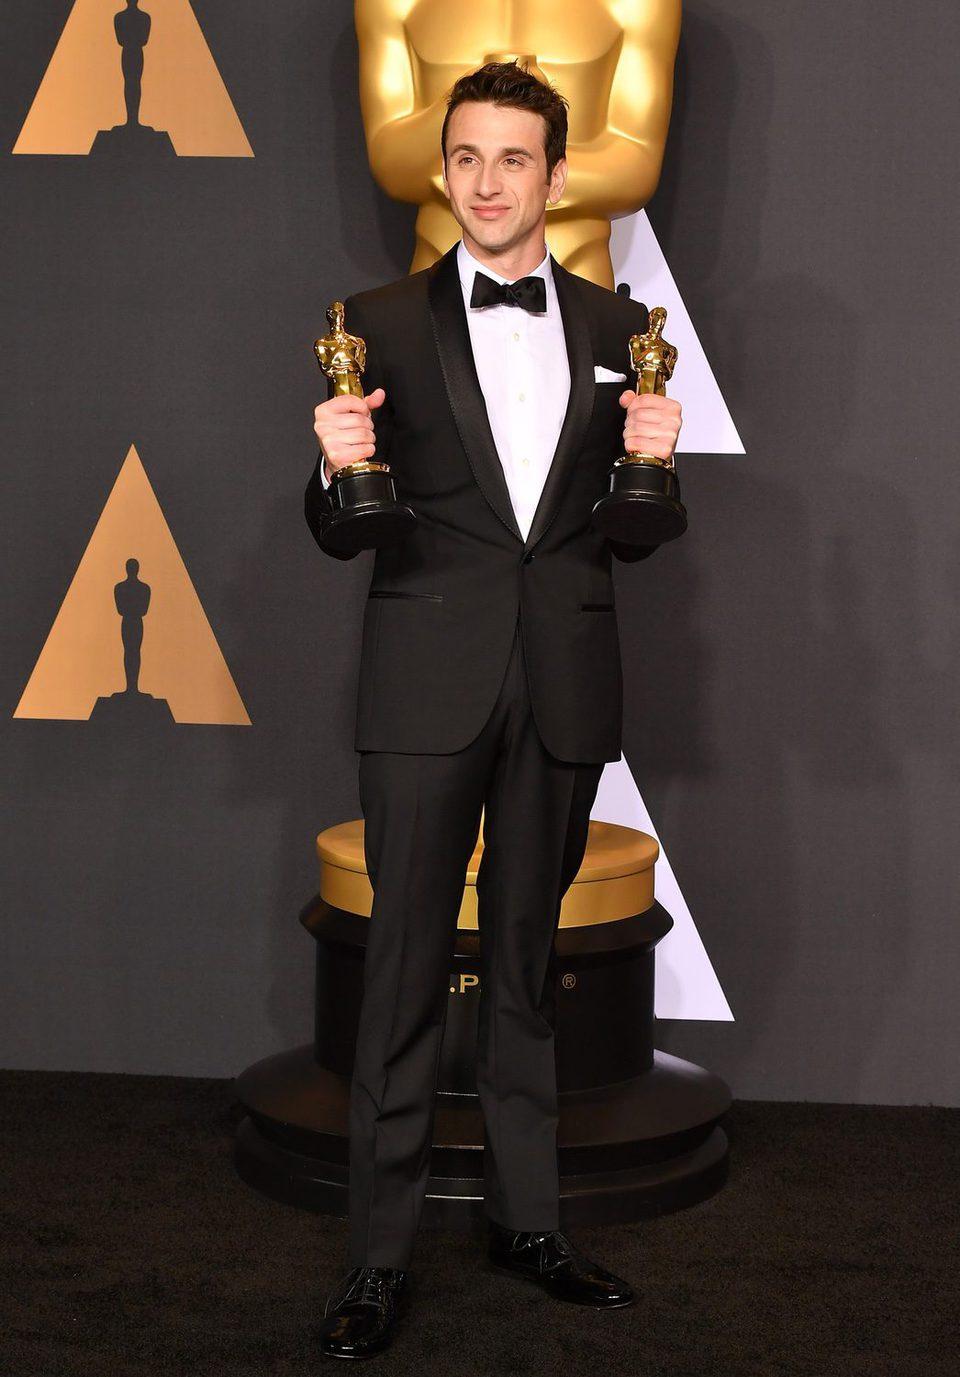 Justin Hurwitz, winner of the Oscar to Best Original Score for 'La La Land'